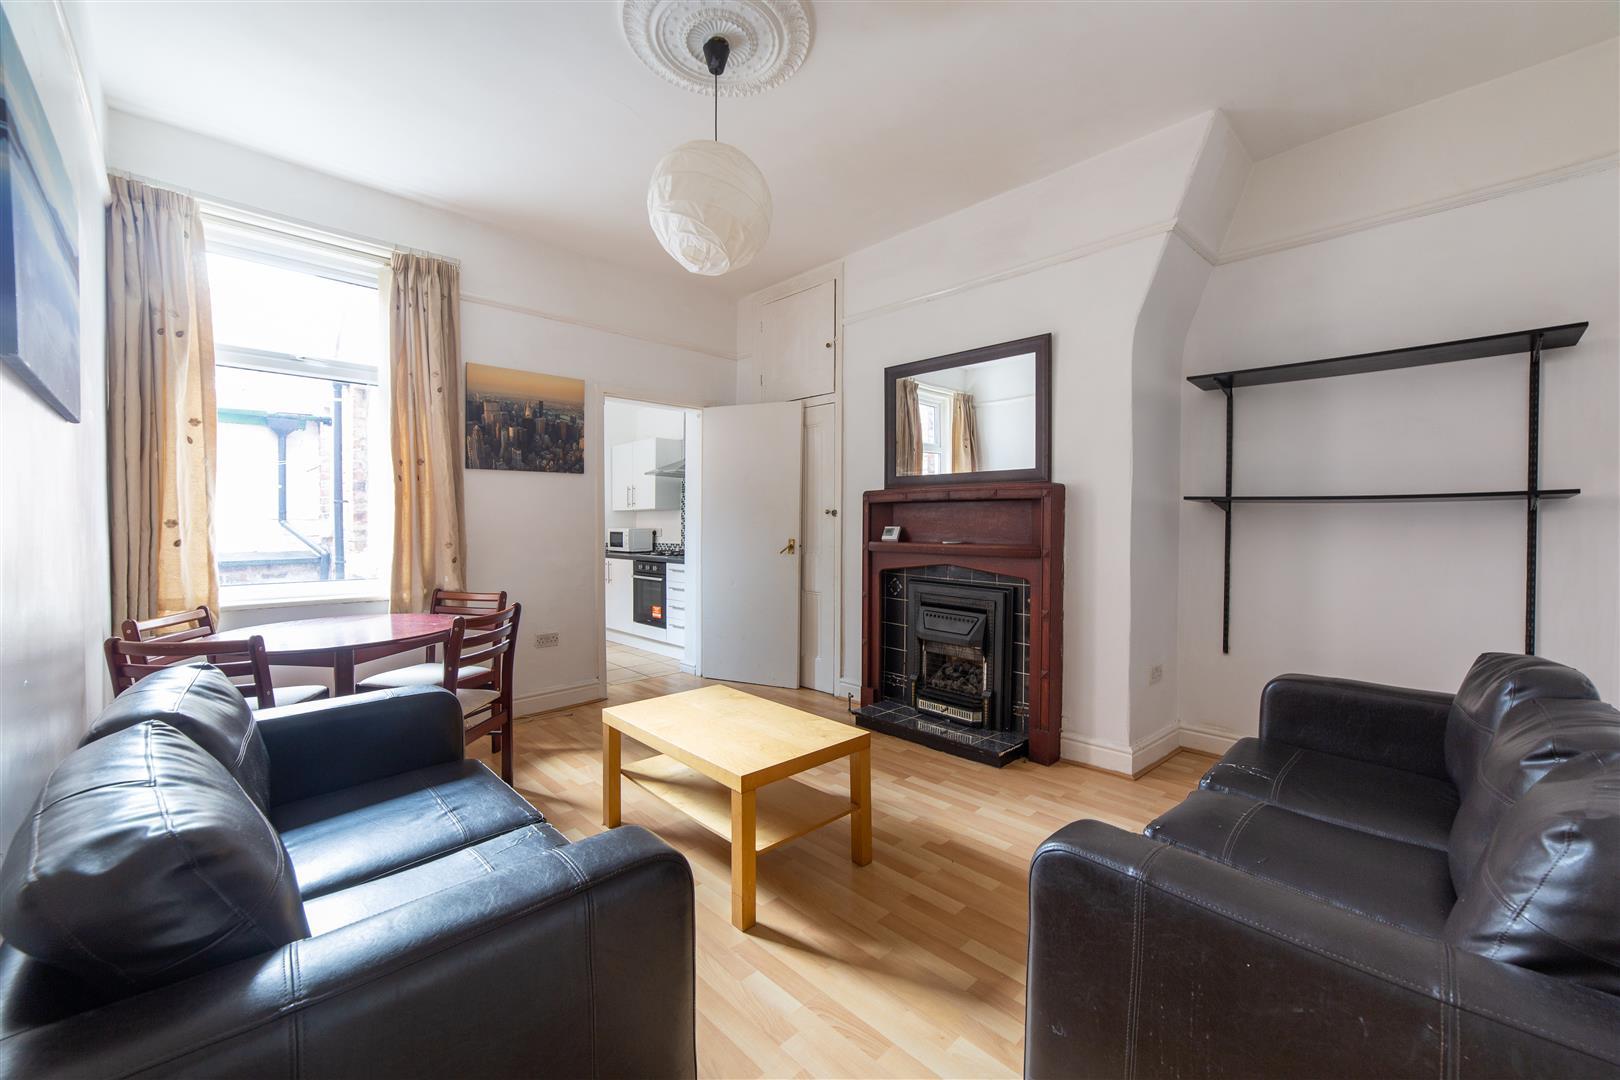 2 bed flat to rent in Newcastle Upon Tyne, NE6 5LS, NE6